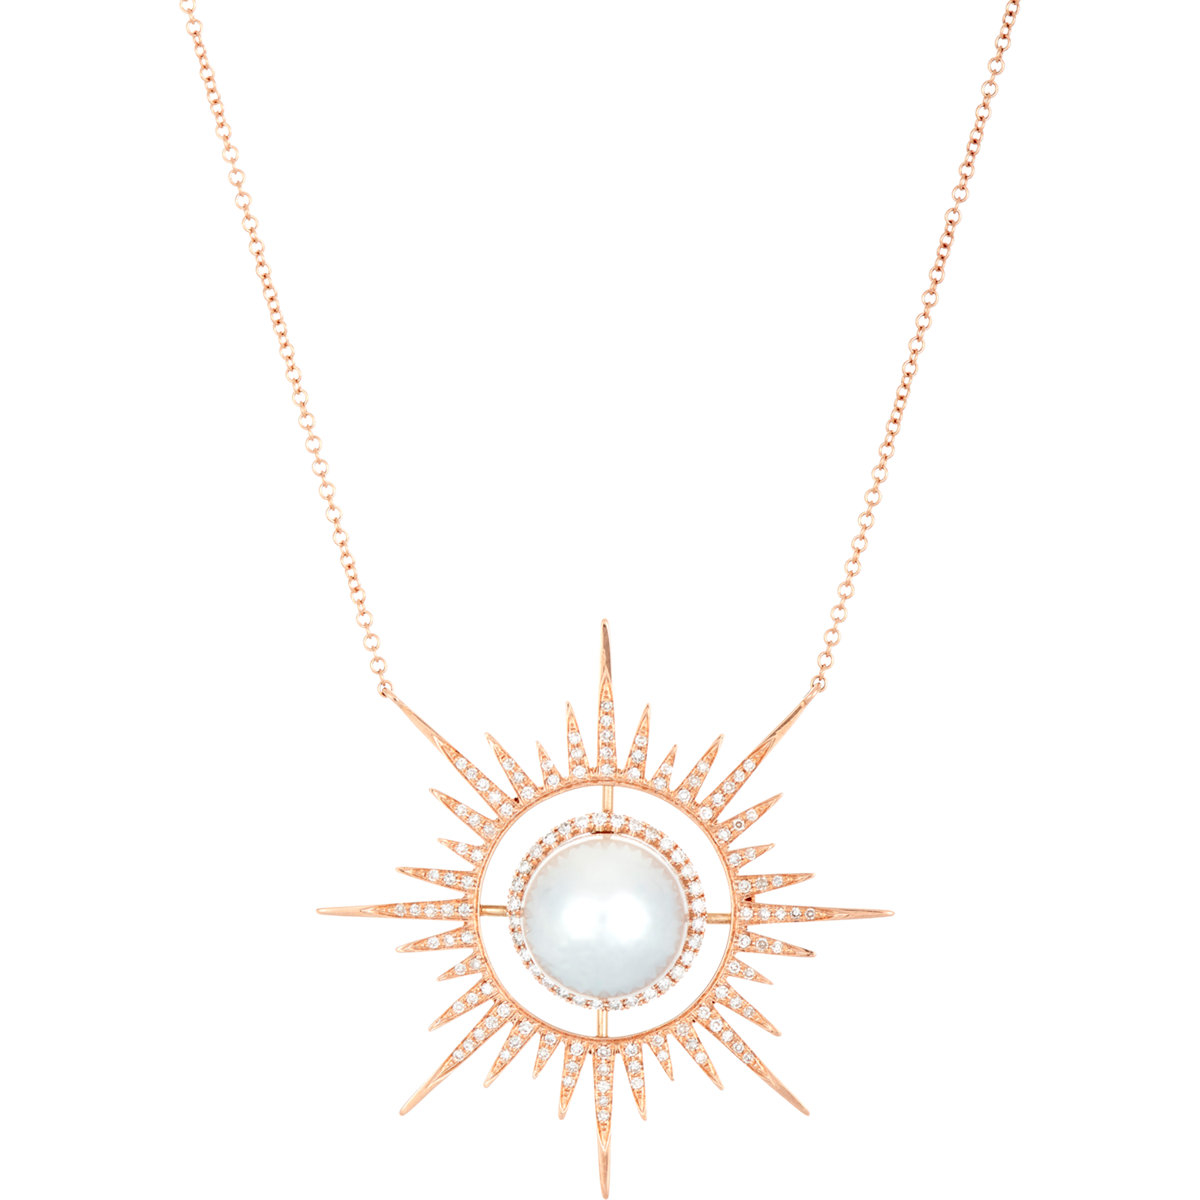 Lyst samira 13 starburst pendant necklace in metallic gallery mozeypictures Images